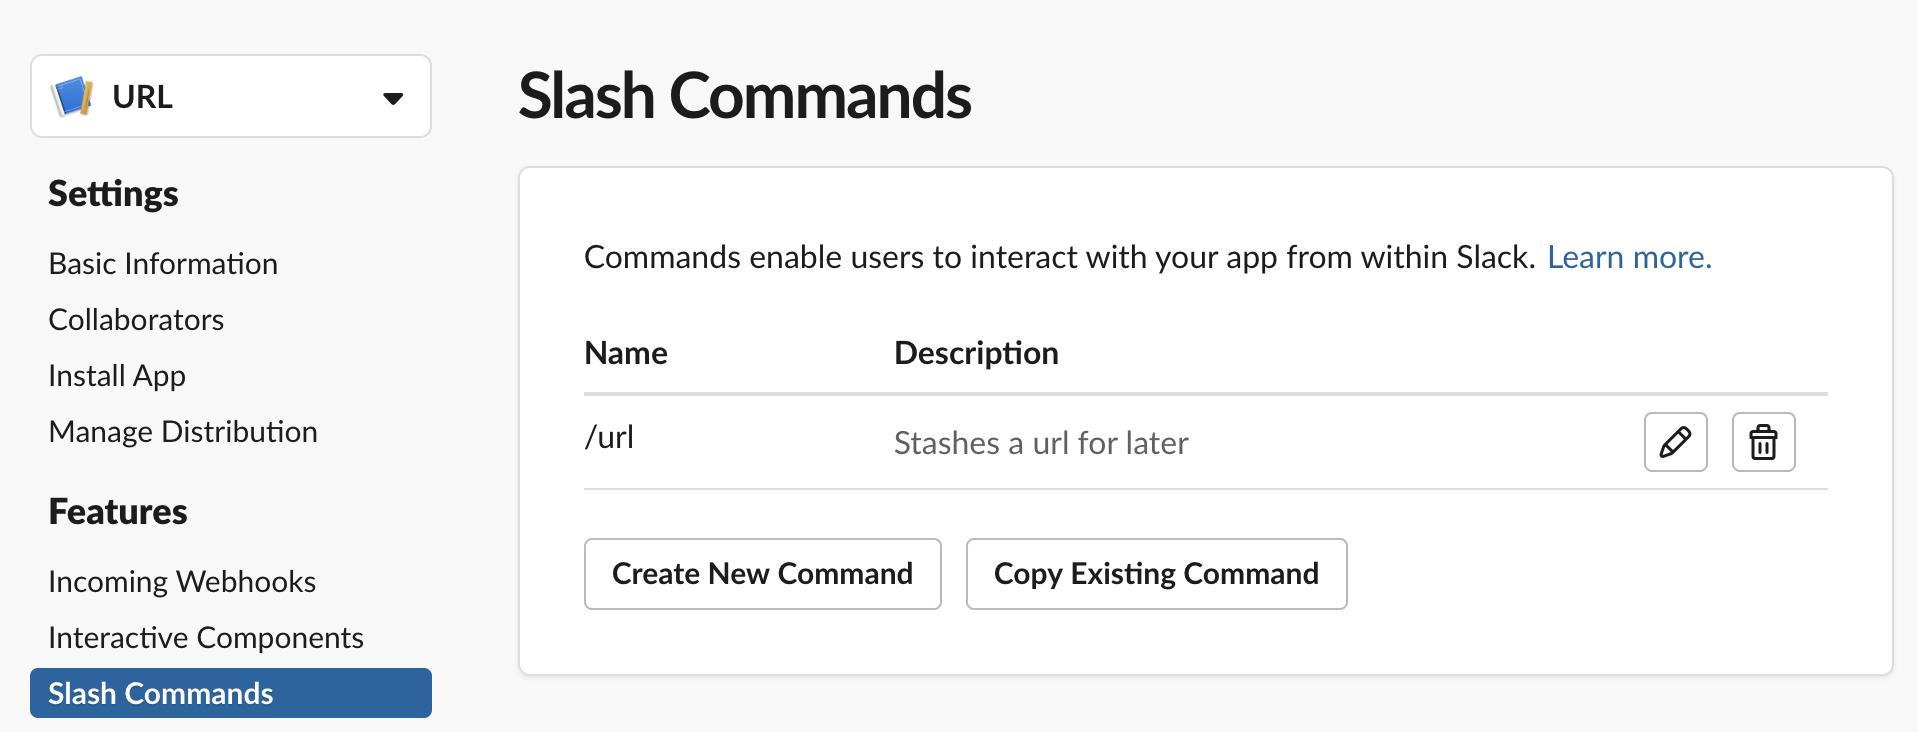 Creatuing a Slash command